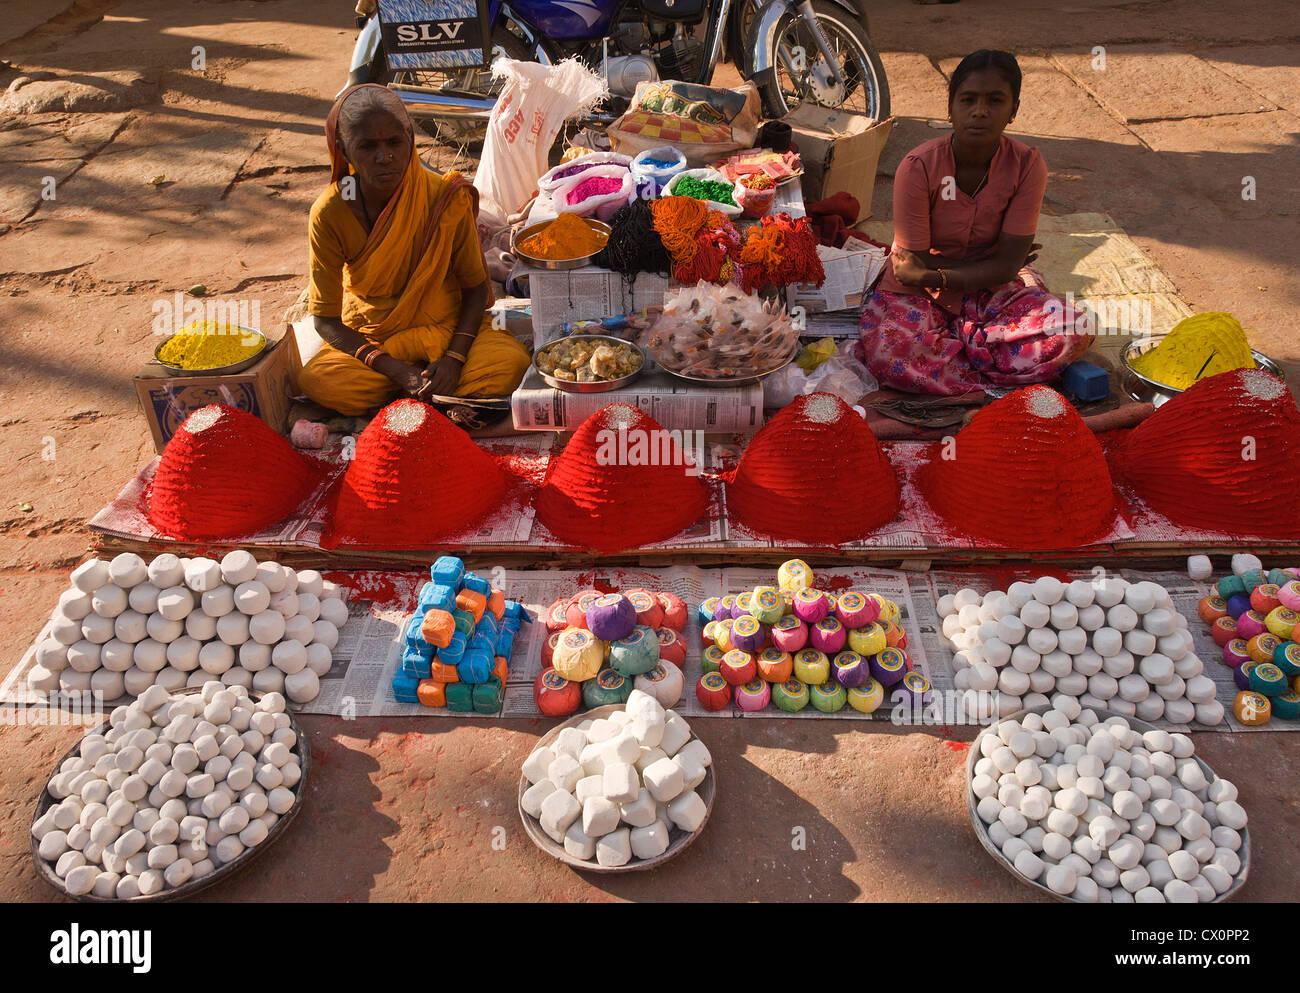 Elk201-2533 India, Karnataka, Hampi, Hampi Bazaar, colored powder vendor - Stock Image